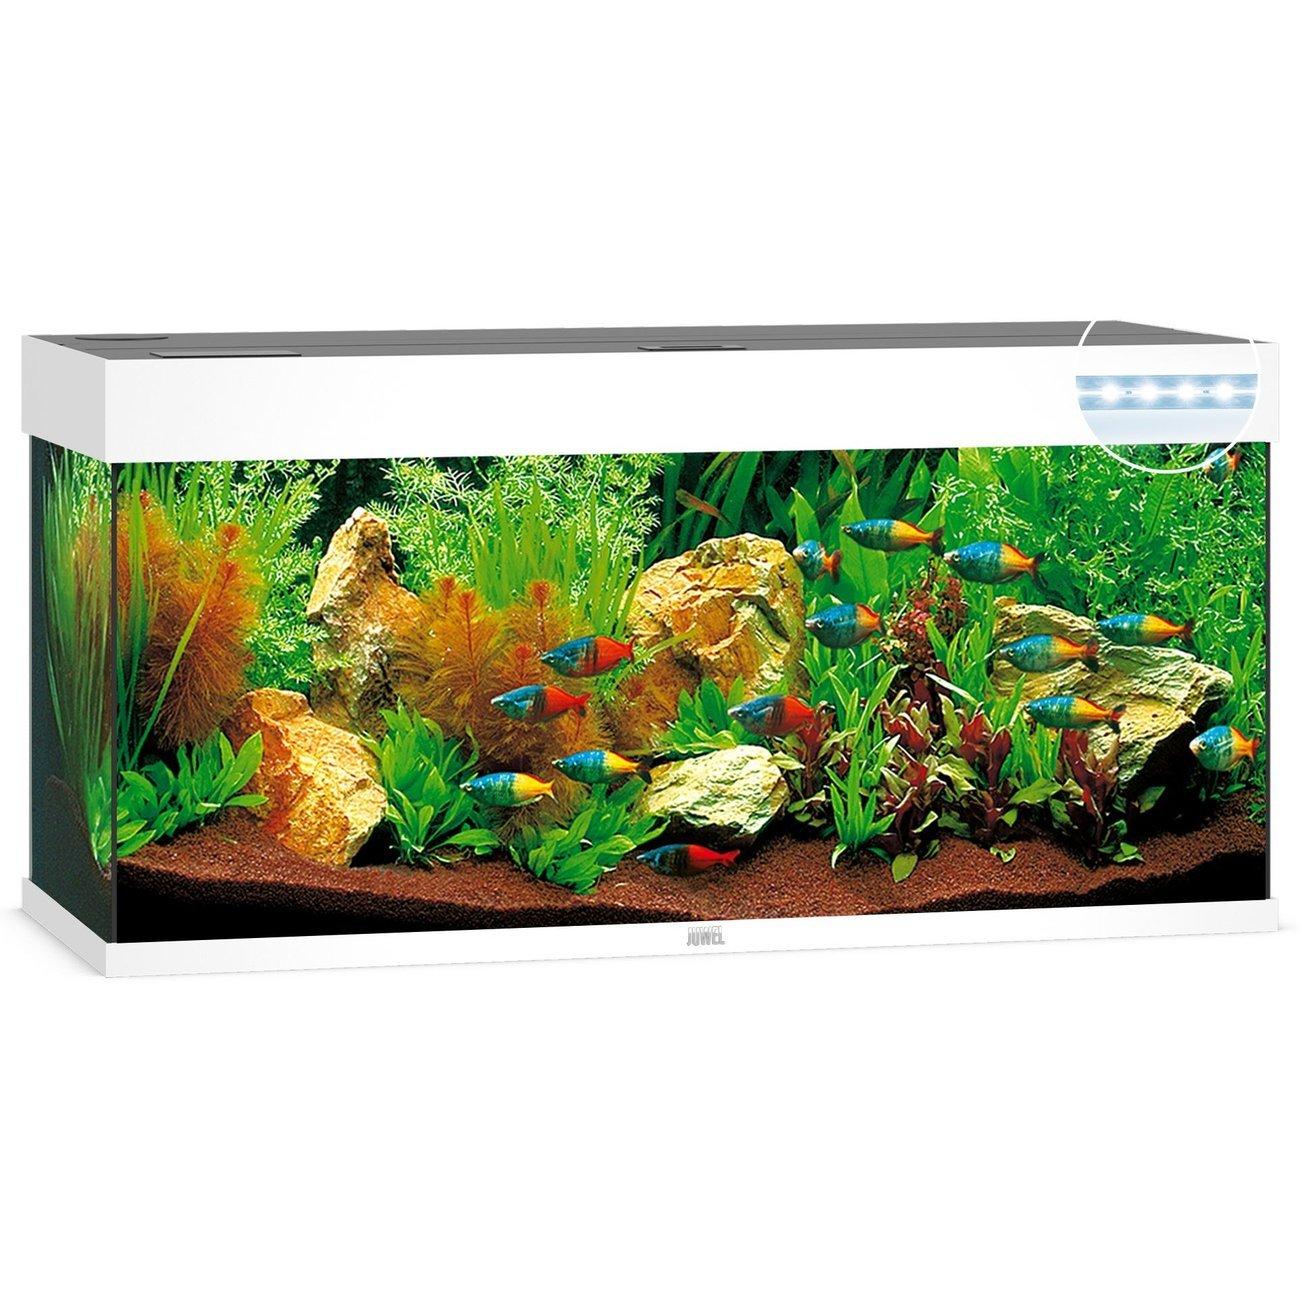 JUWEL Rio 240 LED Aquarium, 240 Liter, weiß